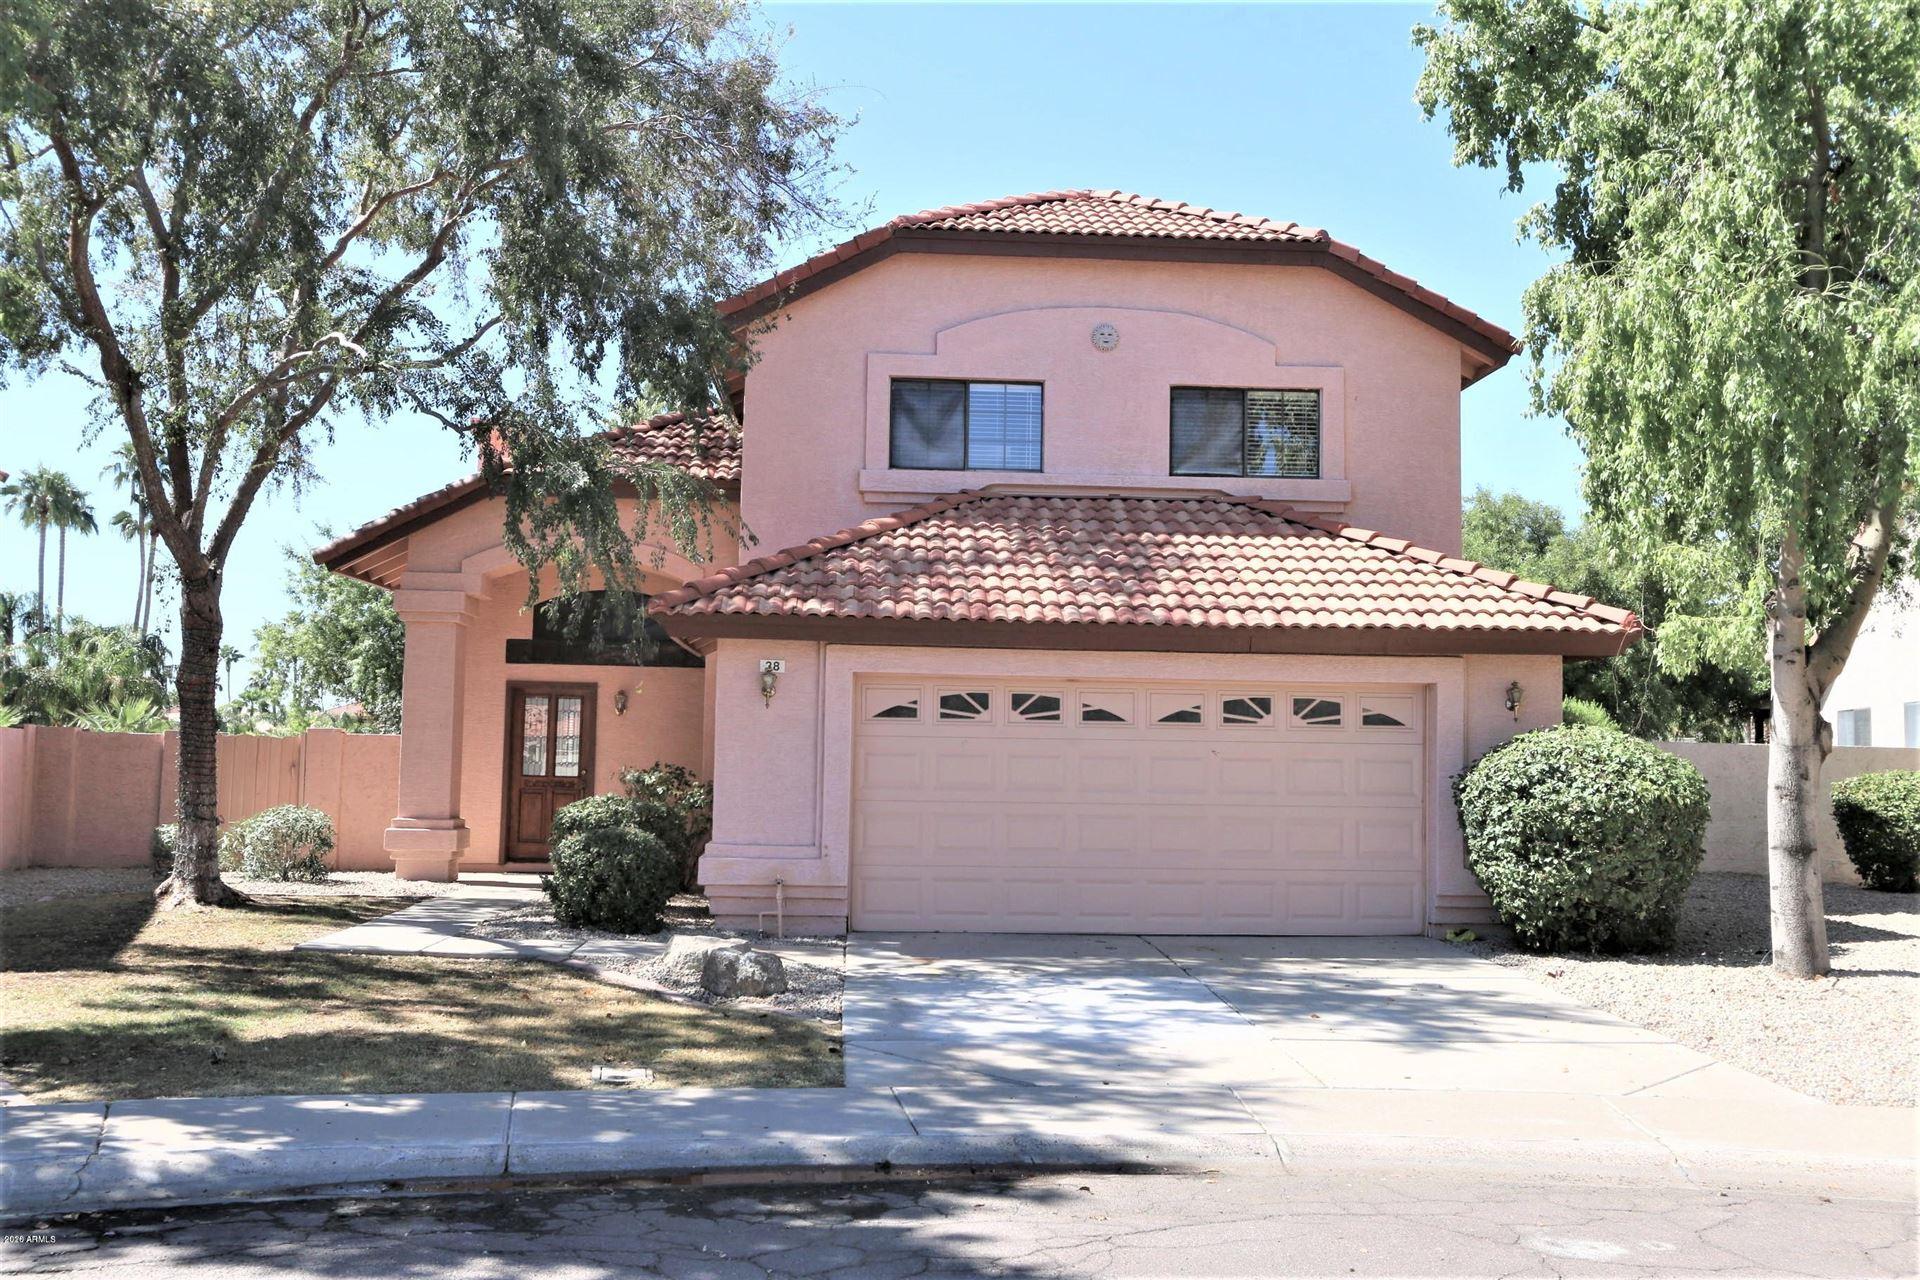 38 S Sundial Drive, Gilbert, AZ 85233 - MLS#: 6105621